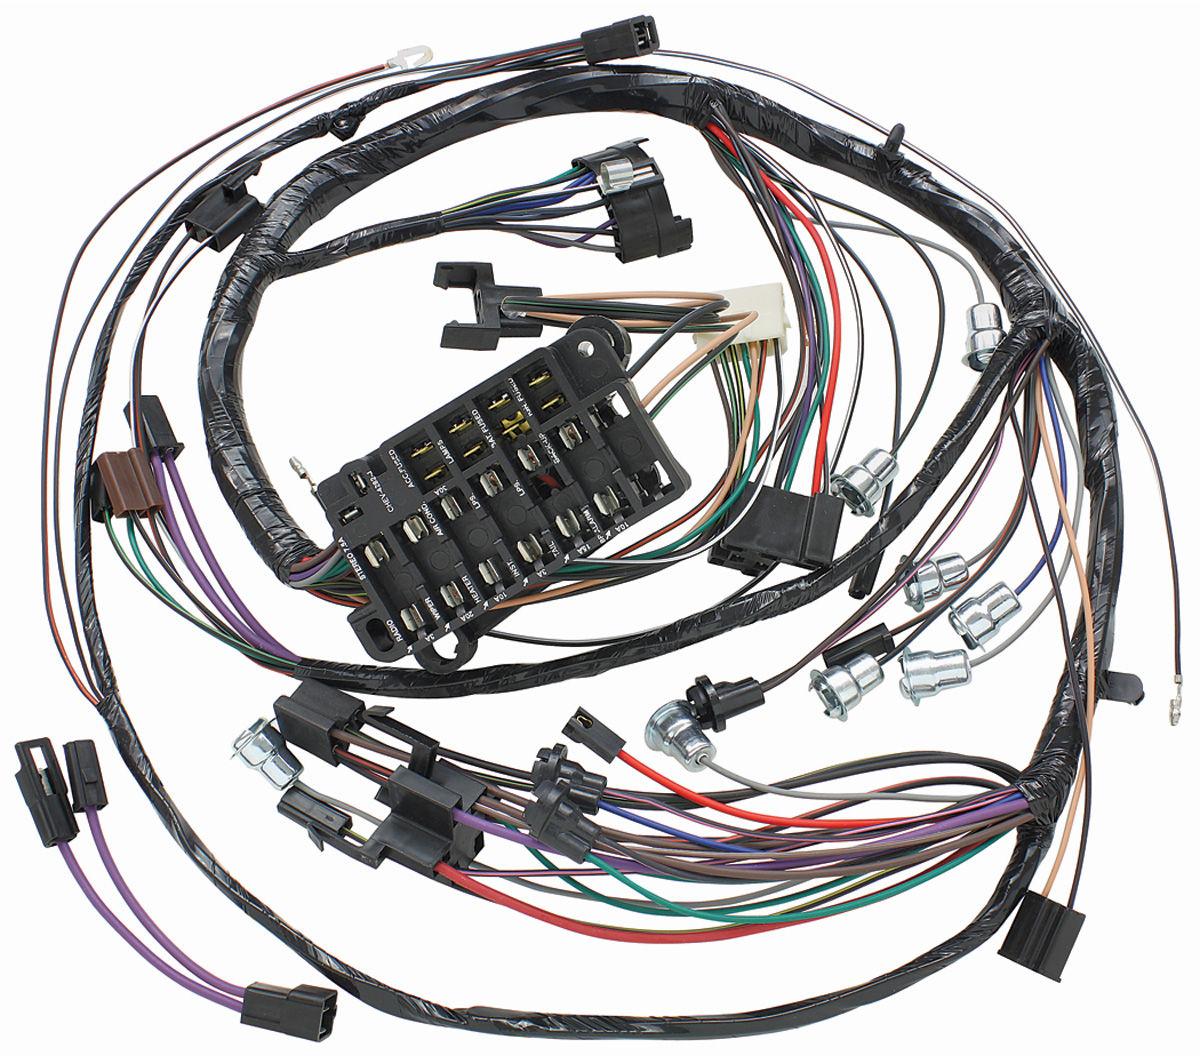 1971 chevelle wiring harness wiring harness  dash  1971 chevelle el camino monte  sweep gauges  wiring harness  dash  1971 chevelle el